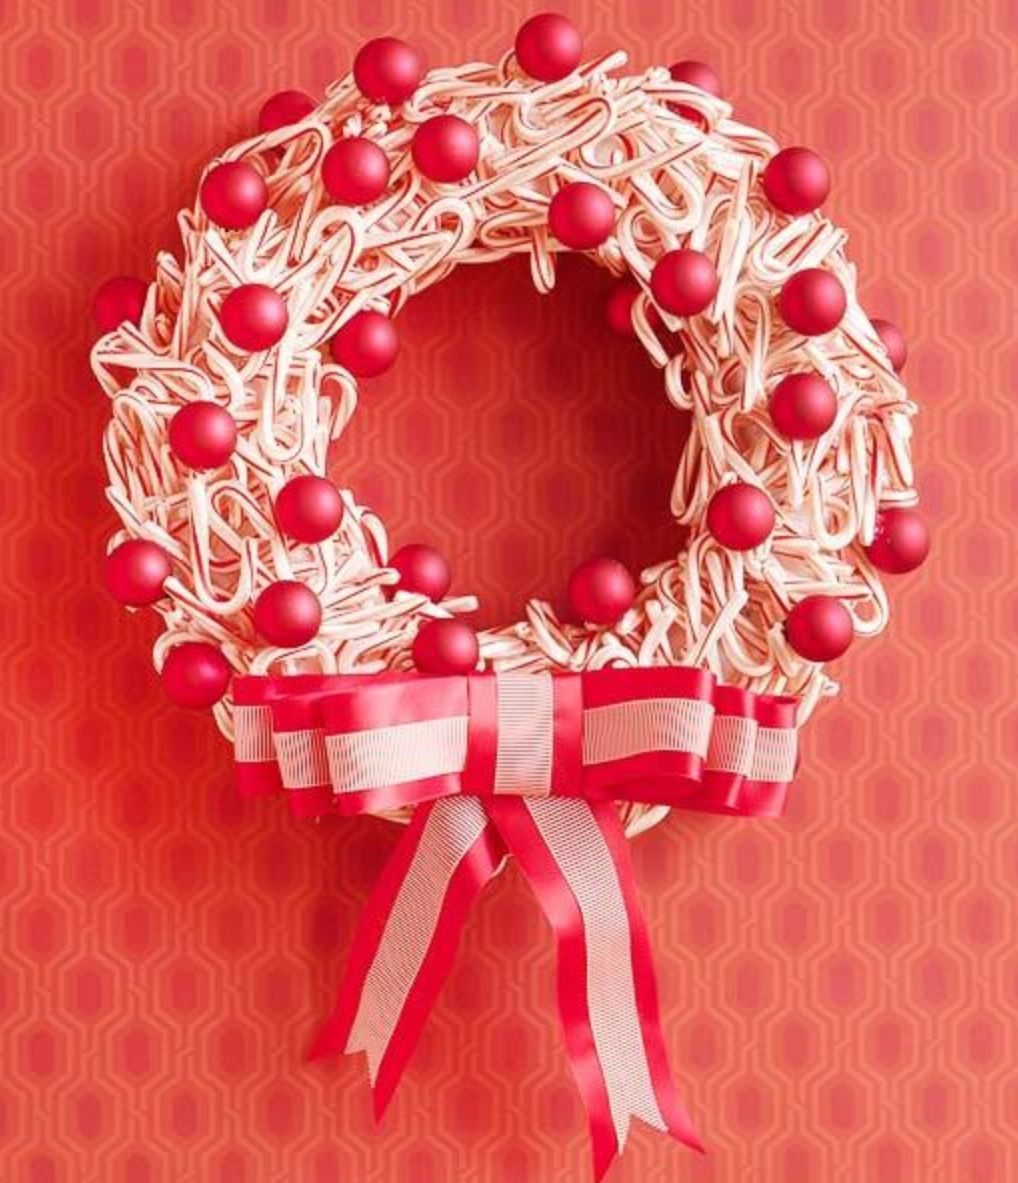 Christmas Wreath Candy  Candy cane wreath Christmas